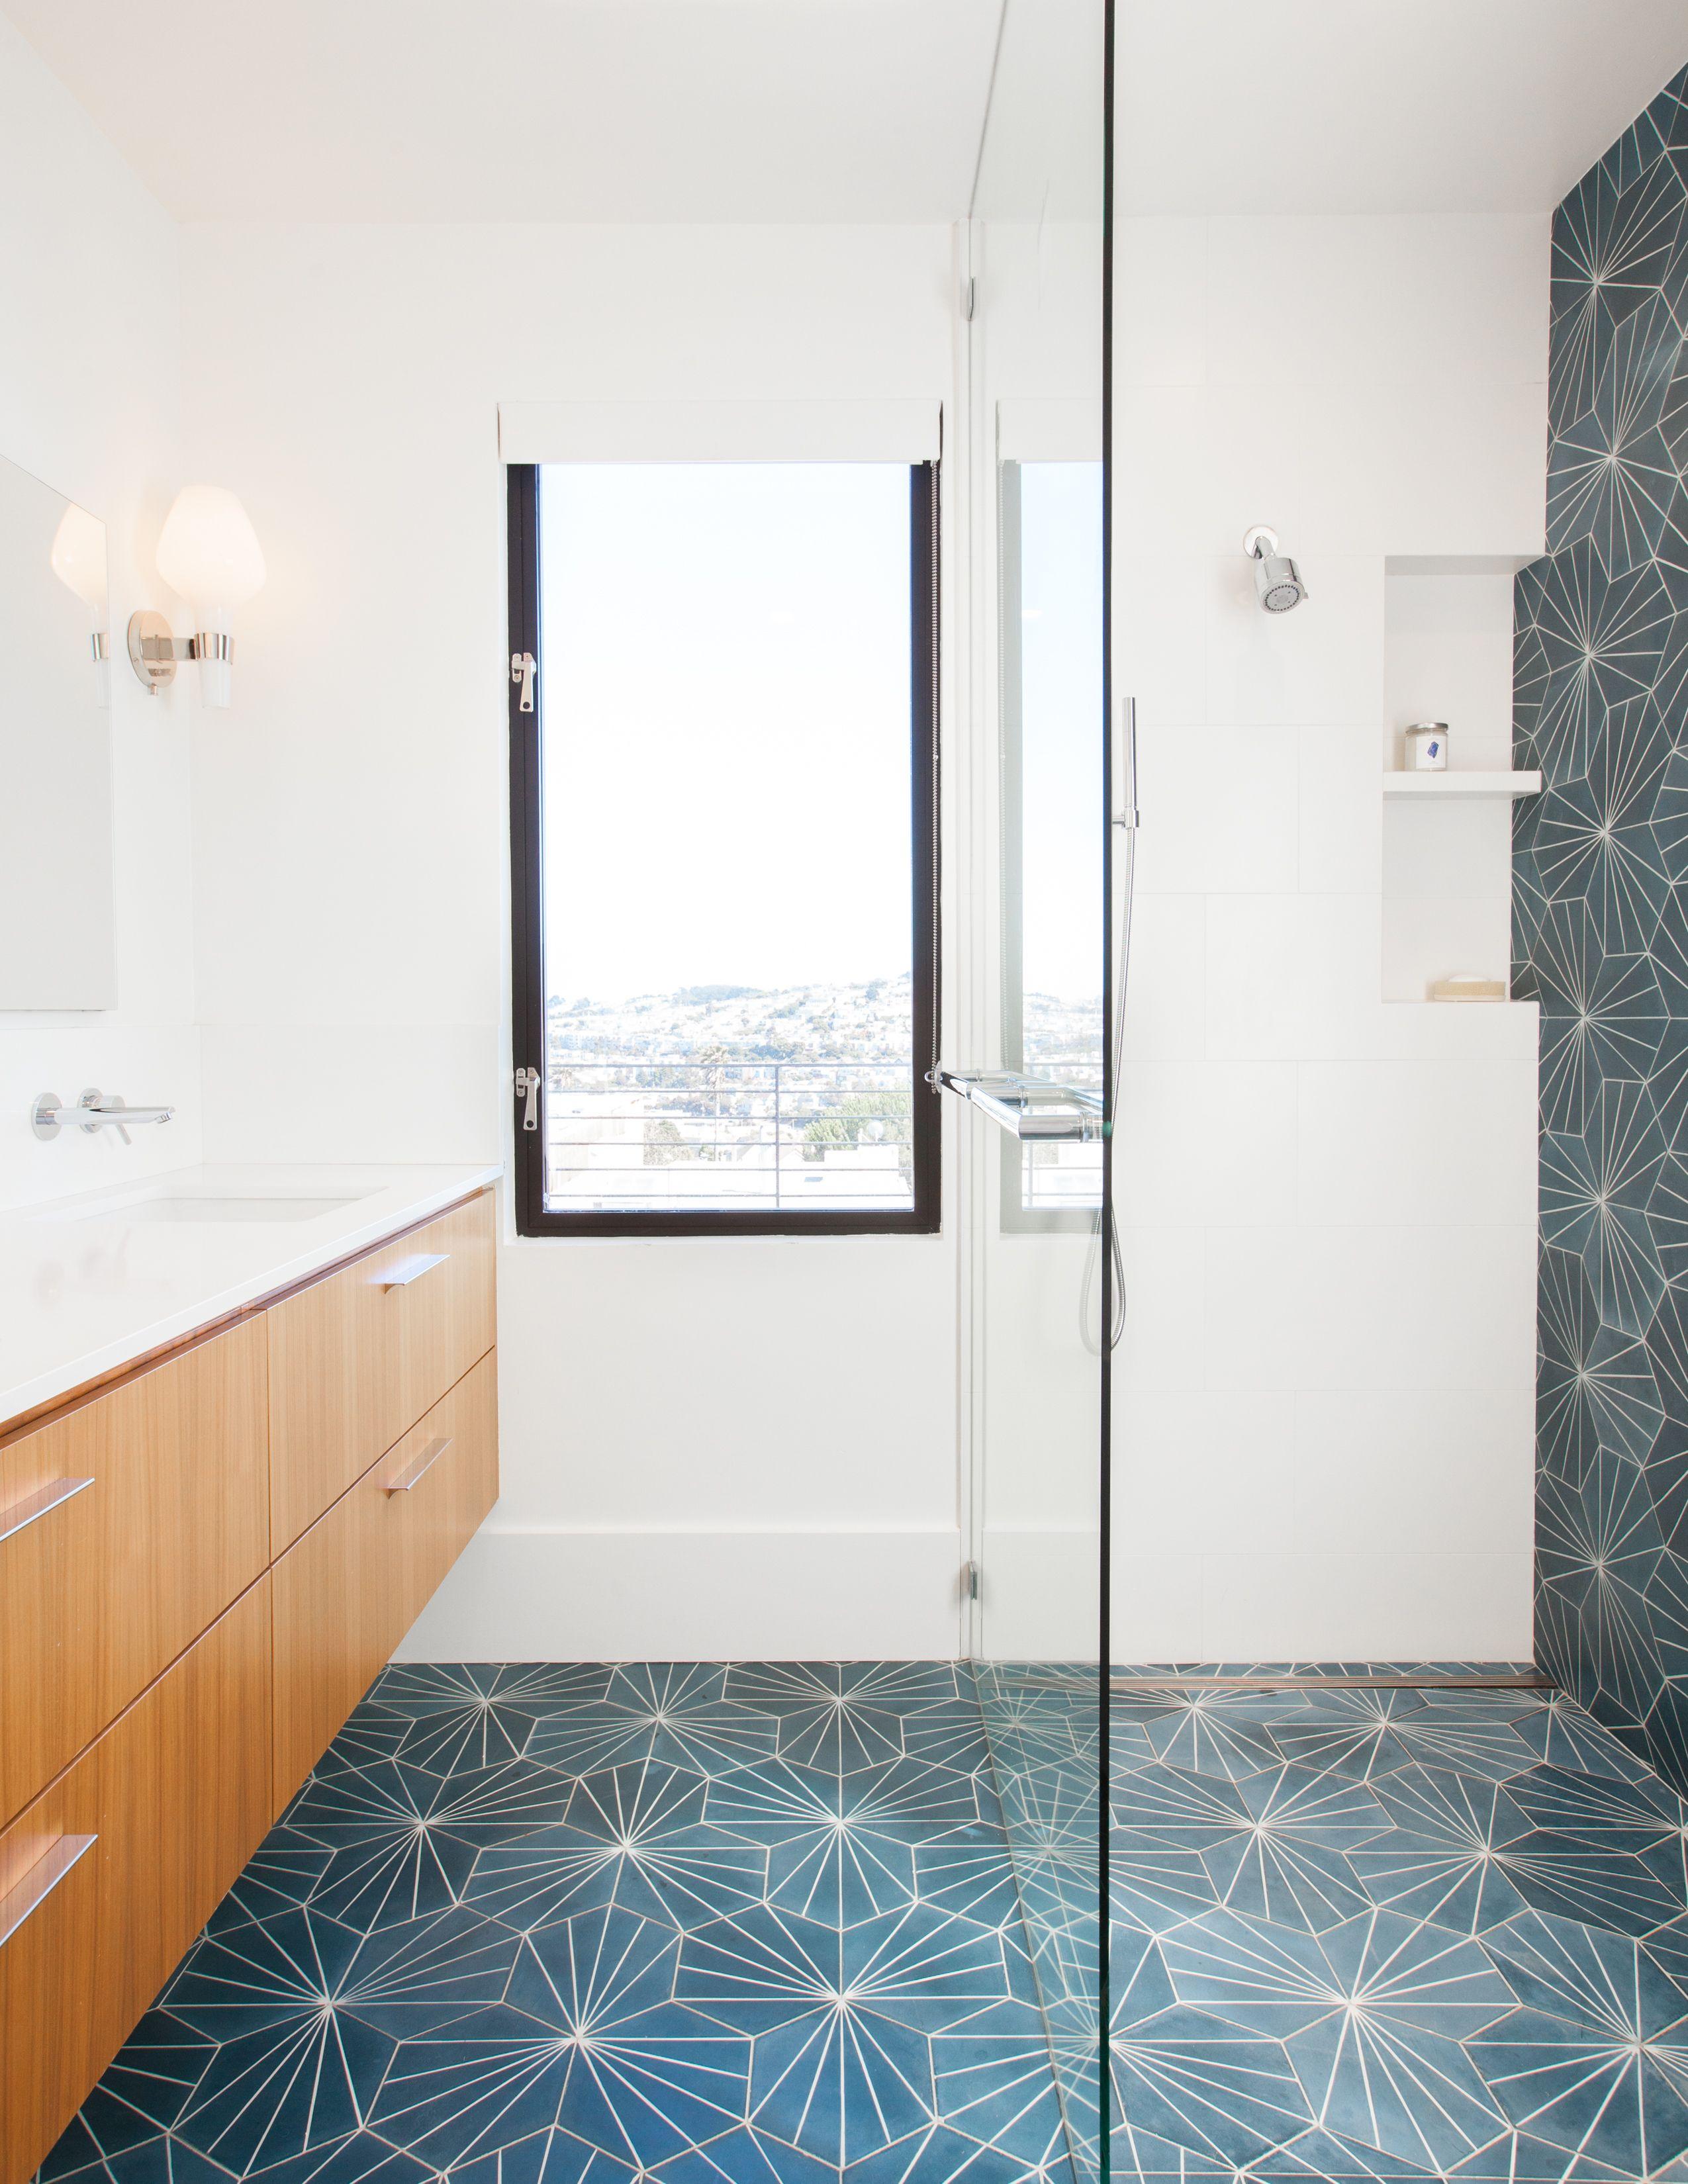 Glen Park House By Mcelroy Architecture Cement Tiles Bathroom Ceramic Floor Tiles Bath Tiles